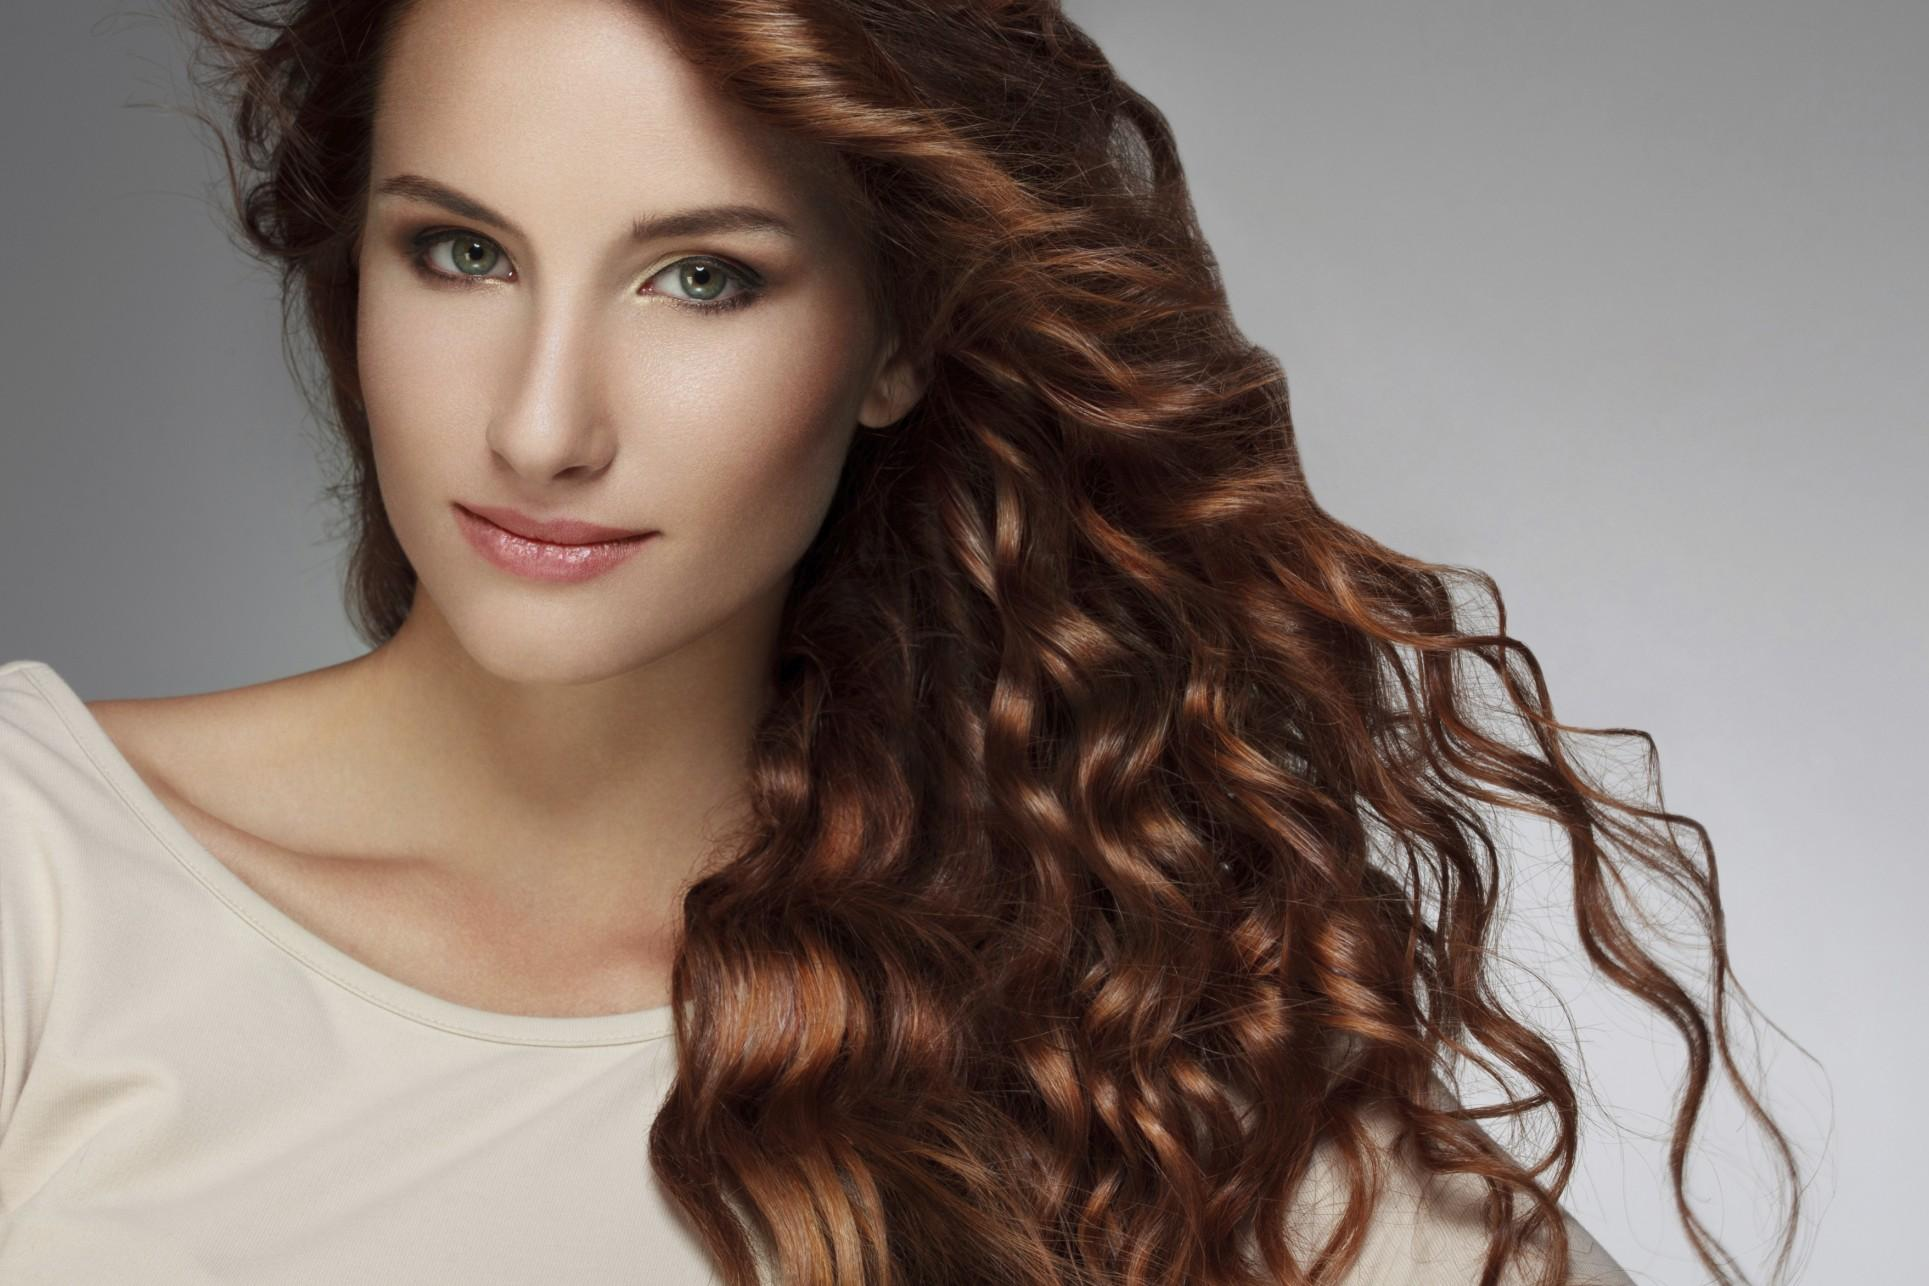 come-arricciare-i-capelli-in-modo-naturale_5a4f7d2c75b37b88e12ffed9251f1695